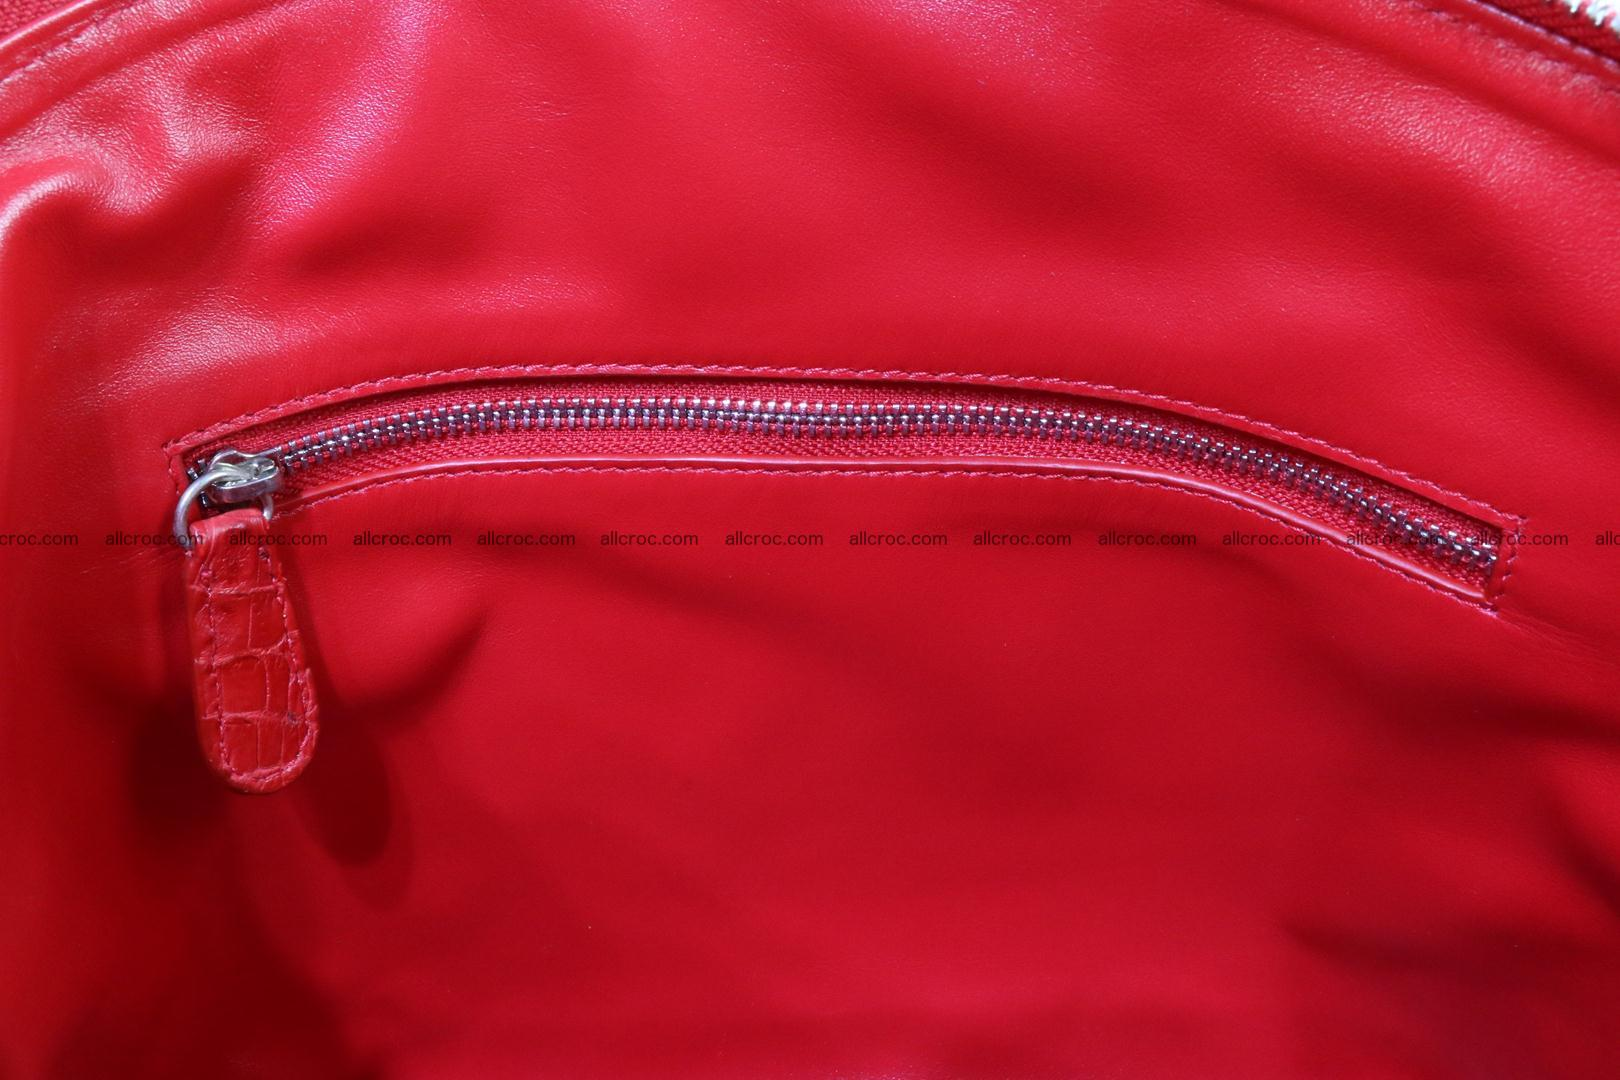 Genuine crocodile handbag for ladies 044 Foto 14